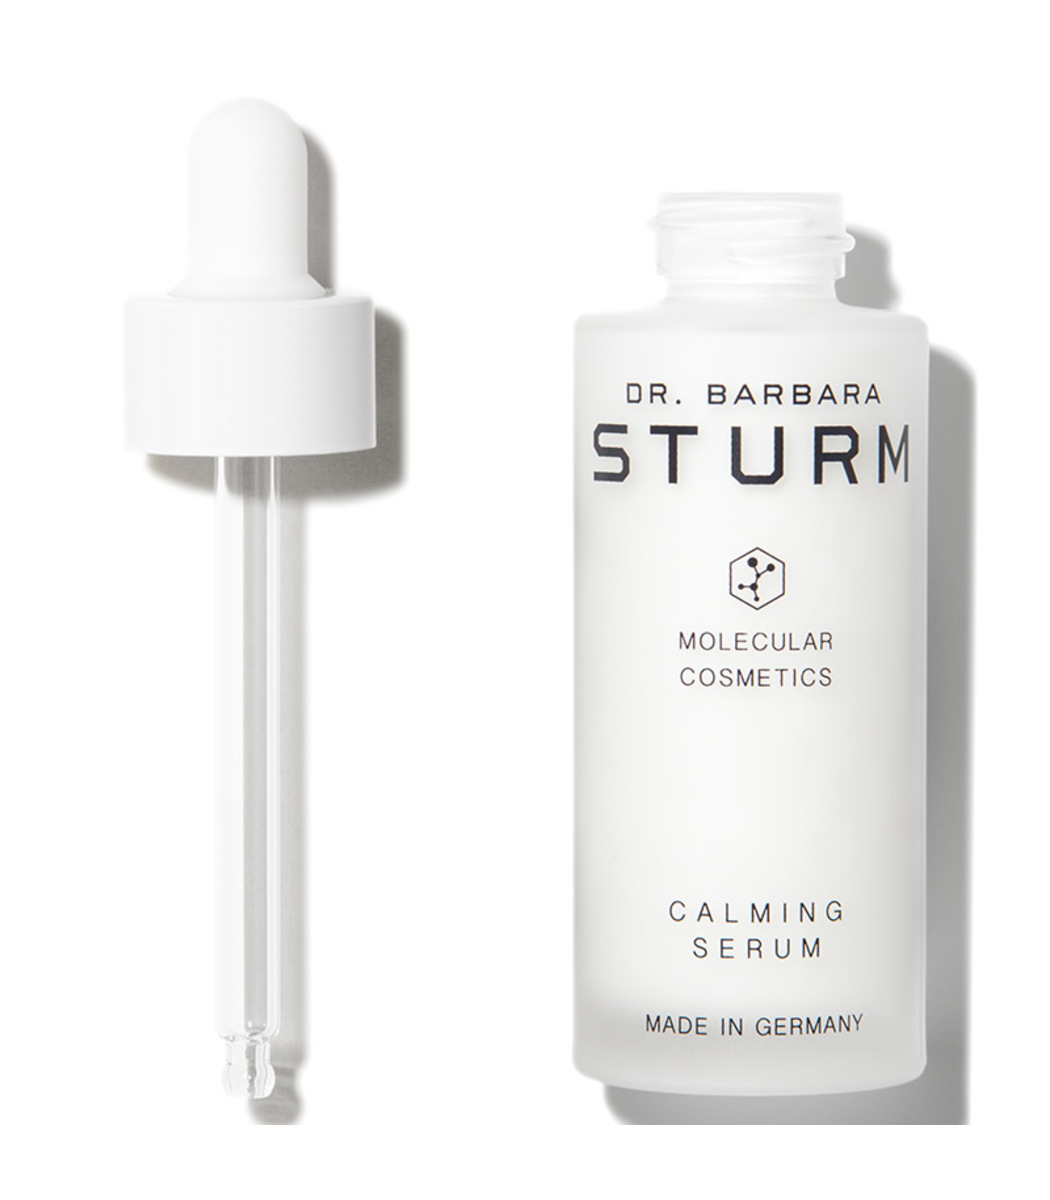 BARBARA STURM Calming Serum